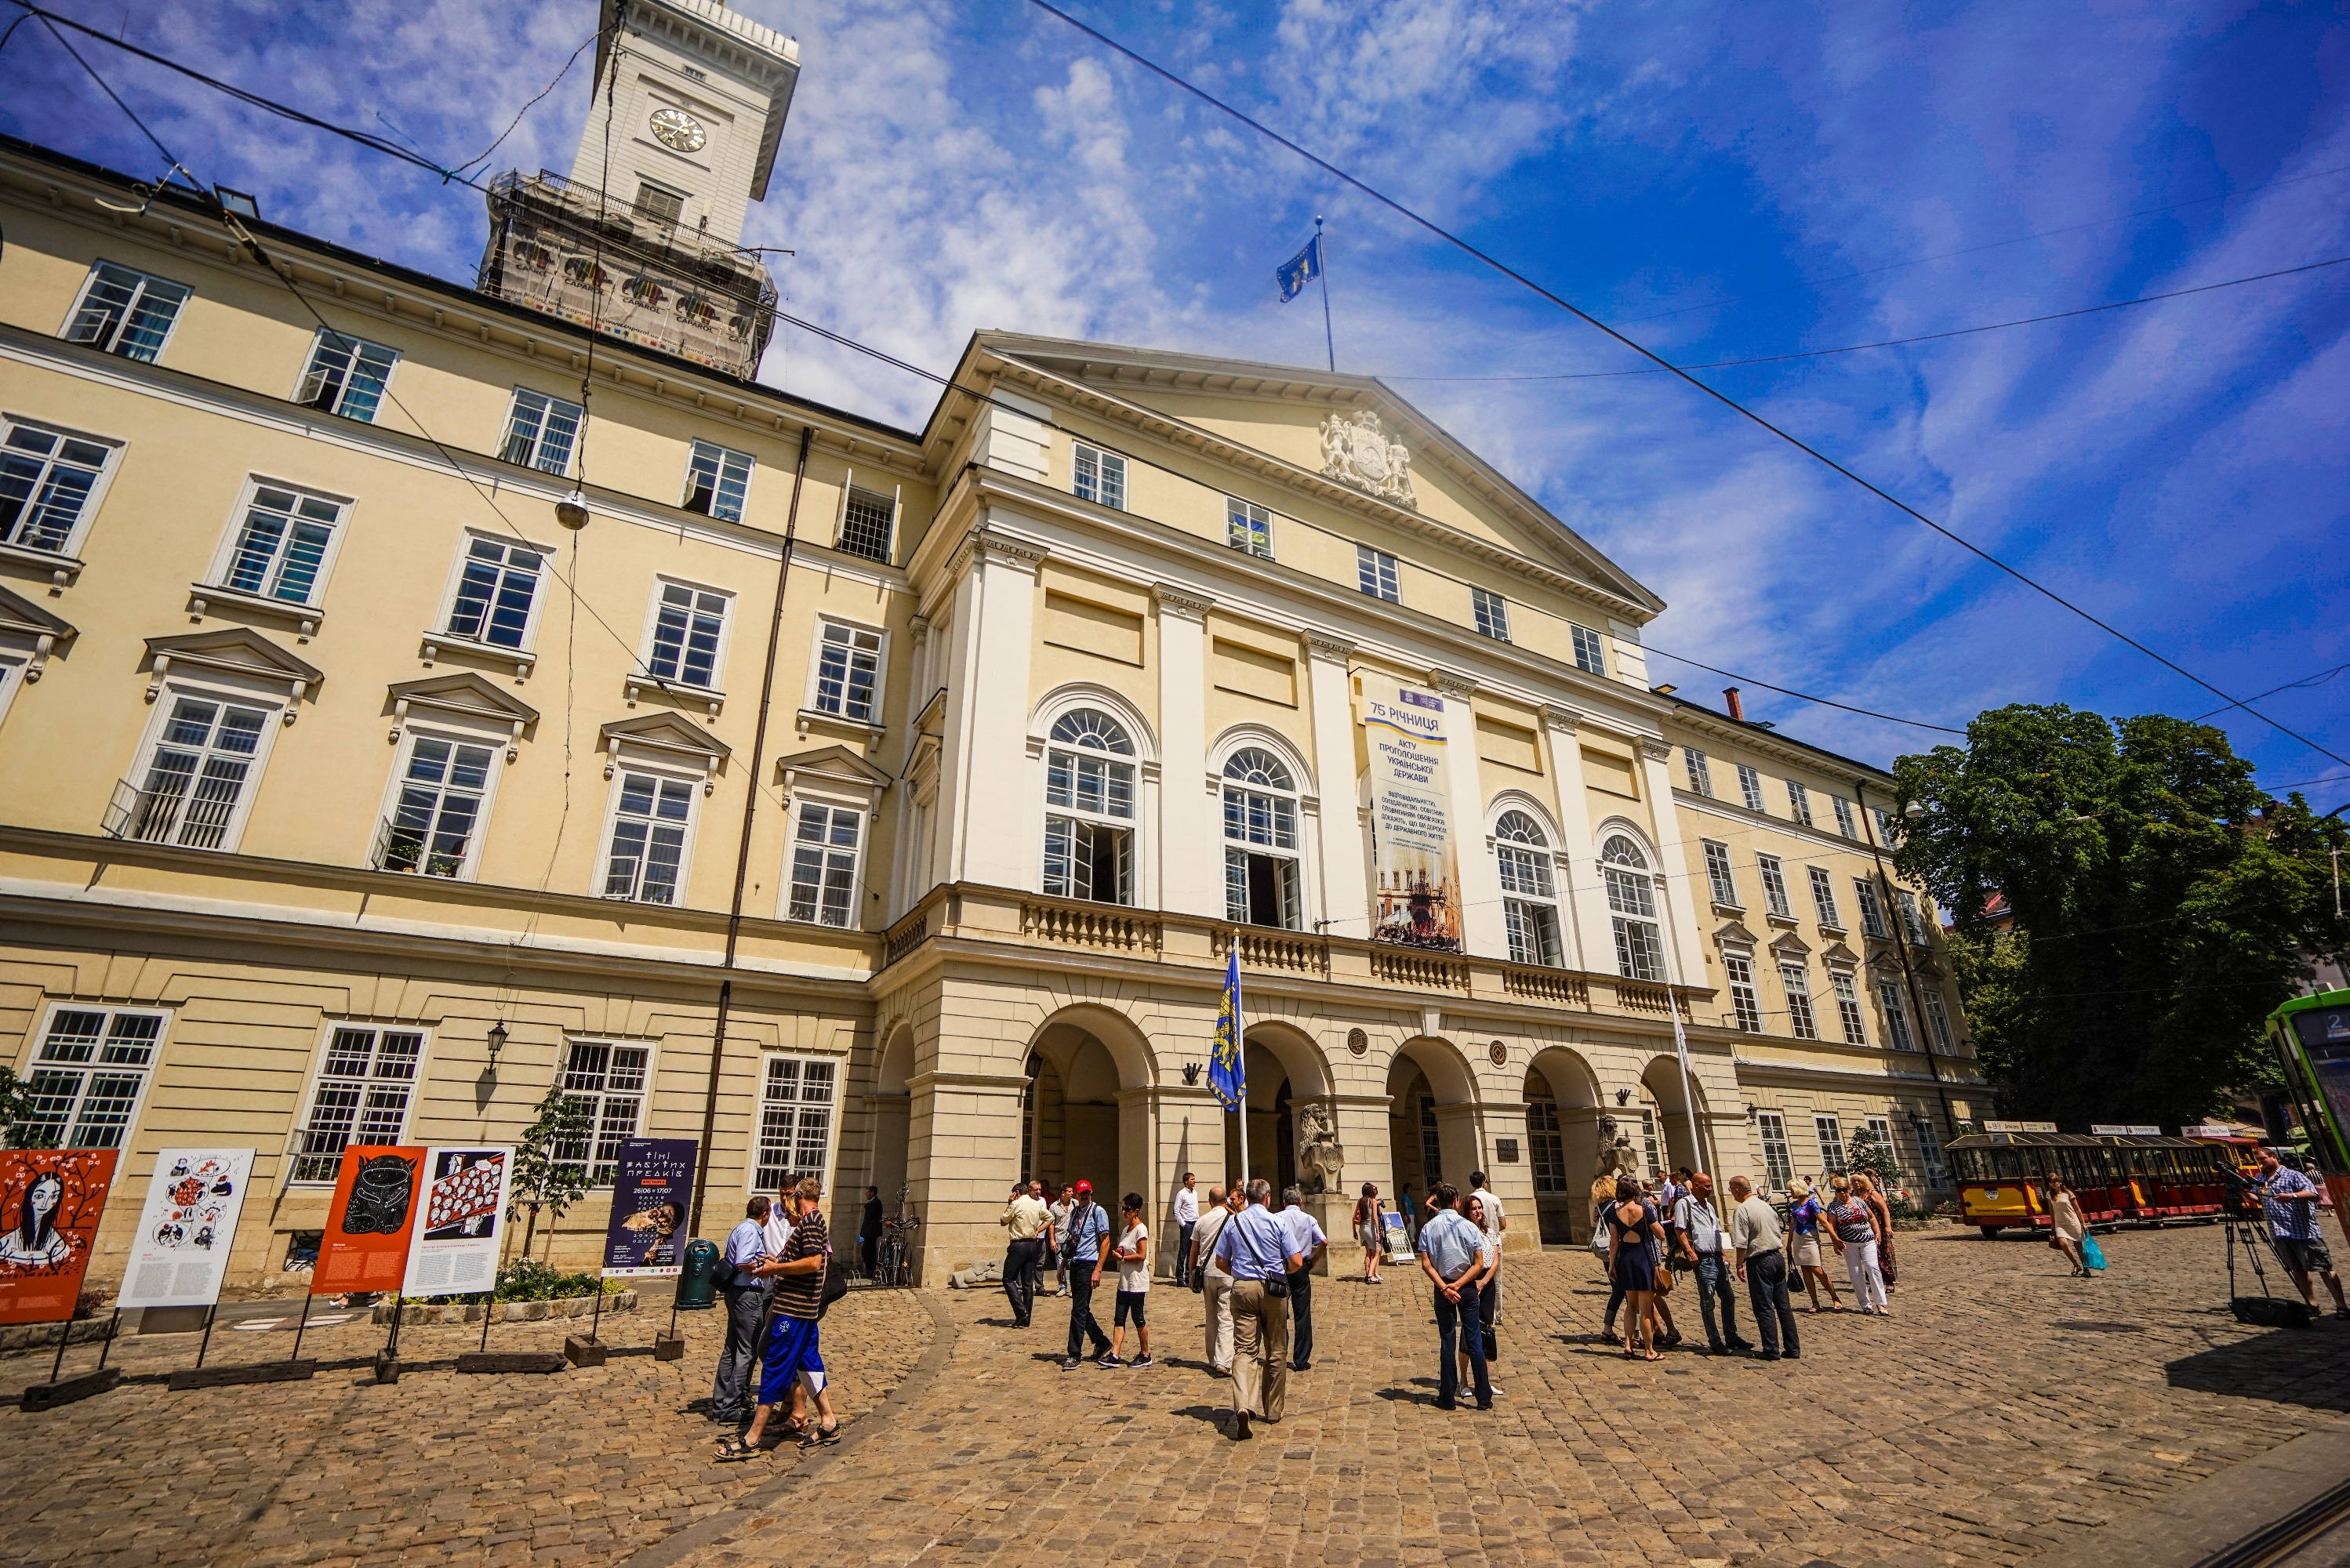 利沃夫市政厅  Town Hall in Lviv   -0